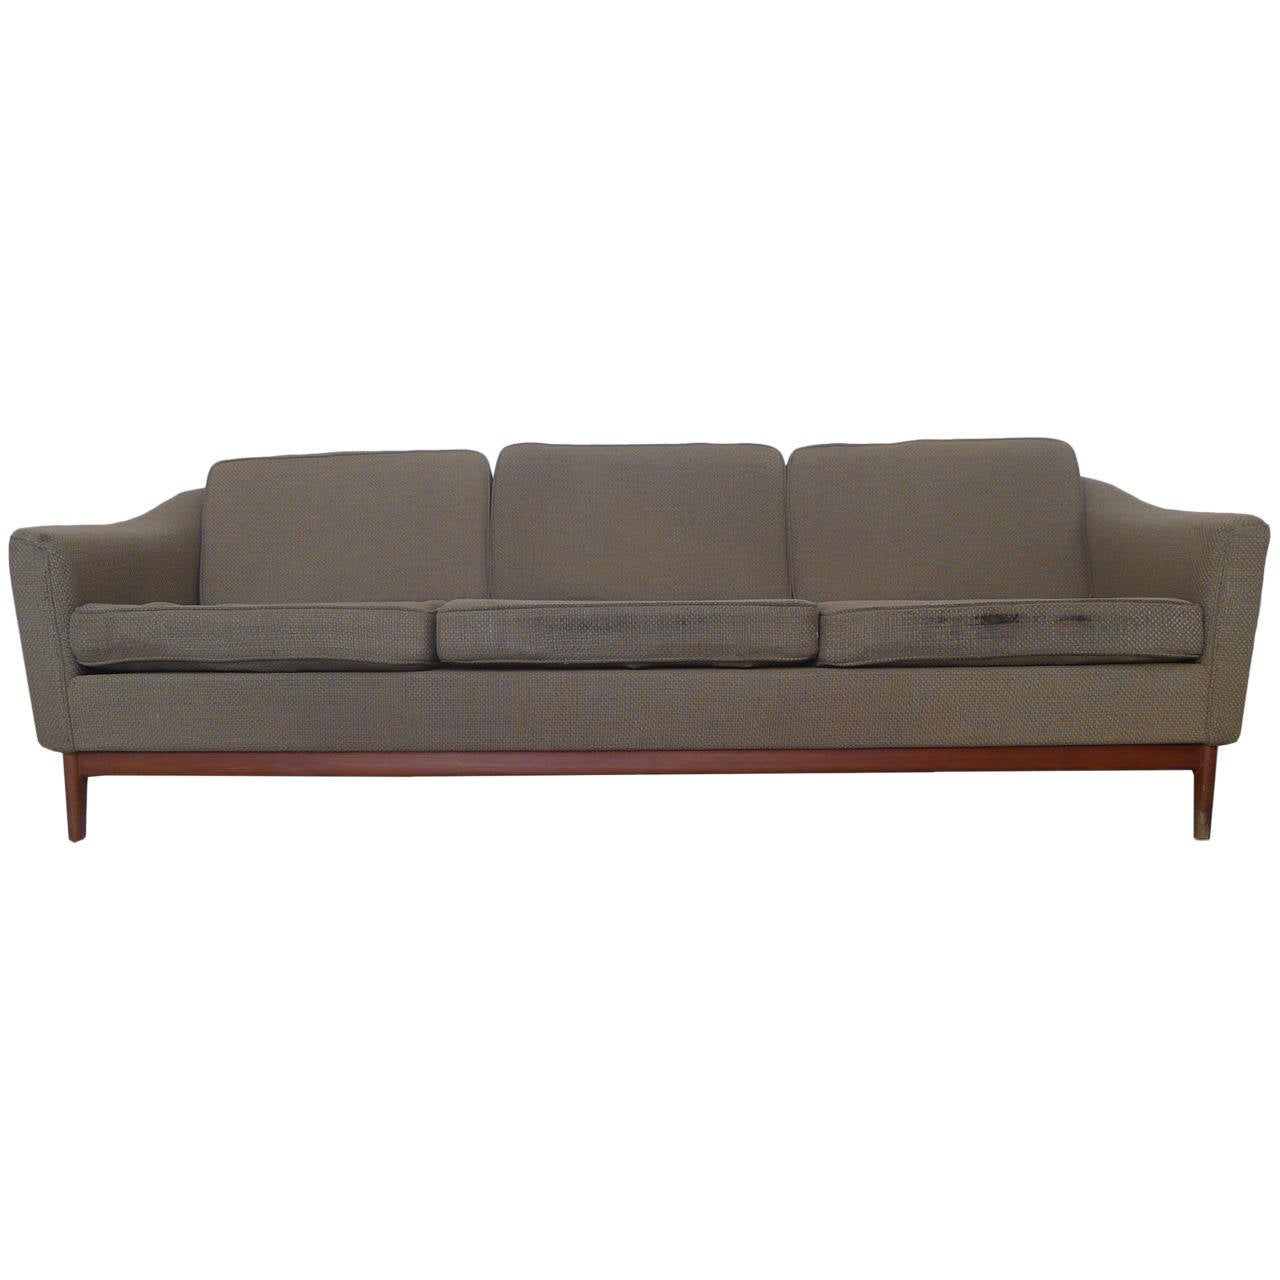 dux sofa by folke ohlsson sectional light grey teak framed designed at 1stdibs